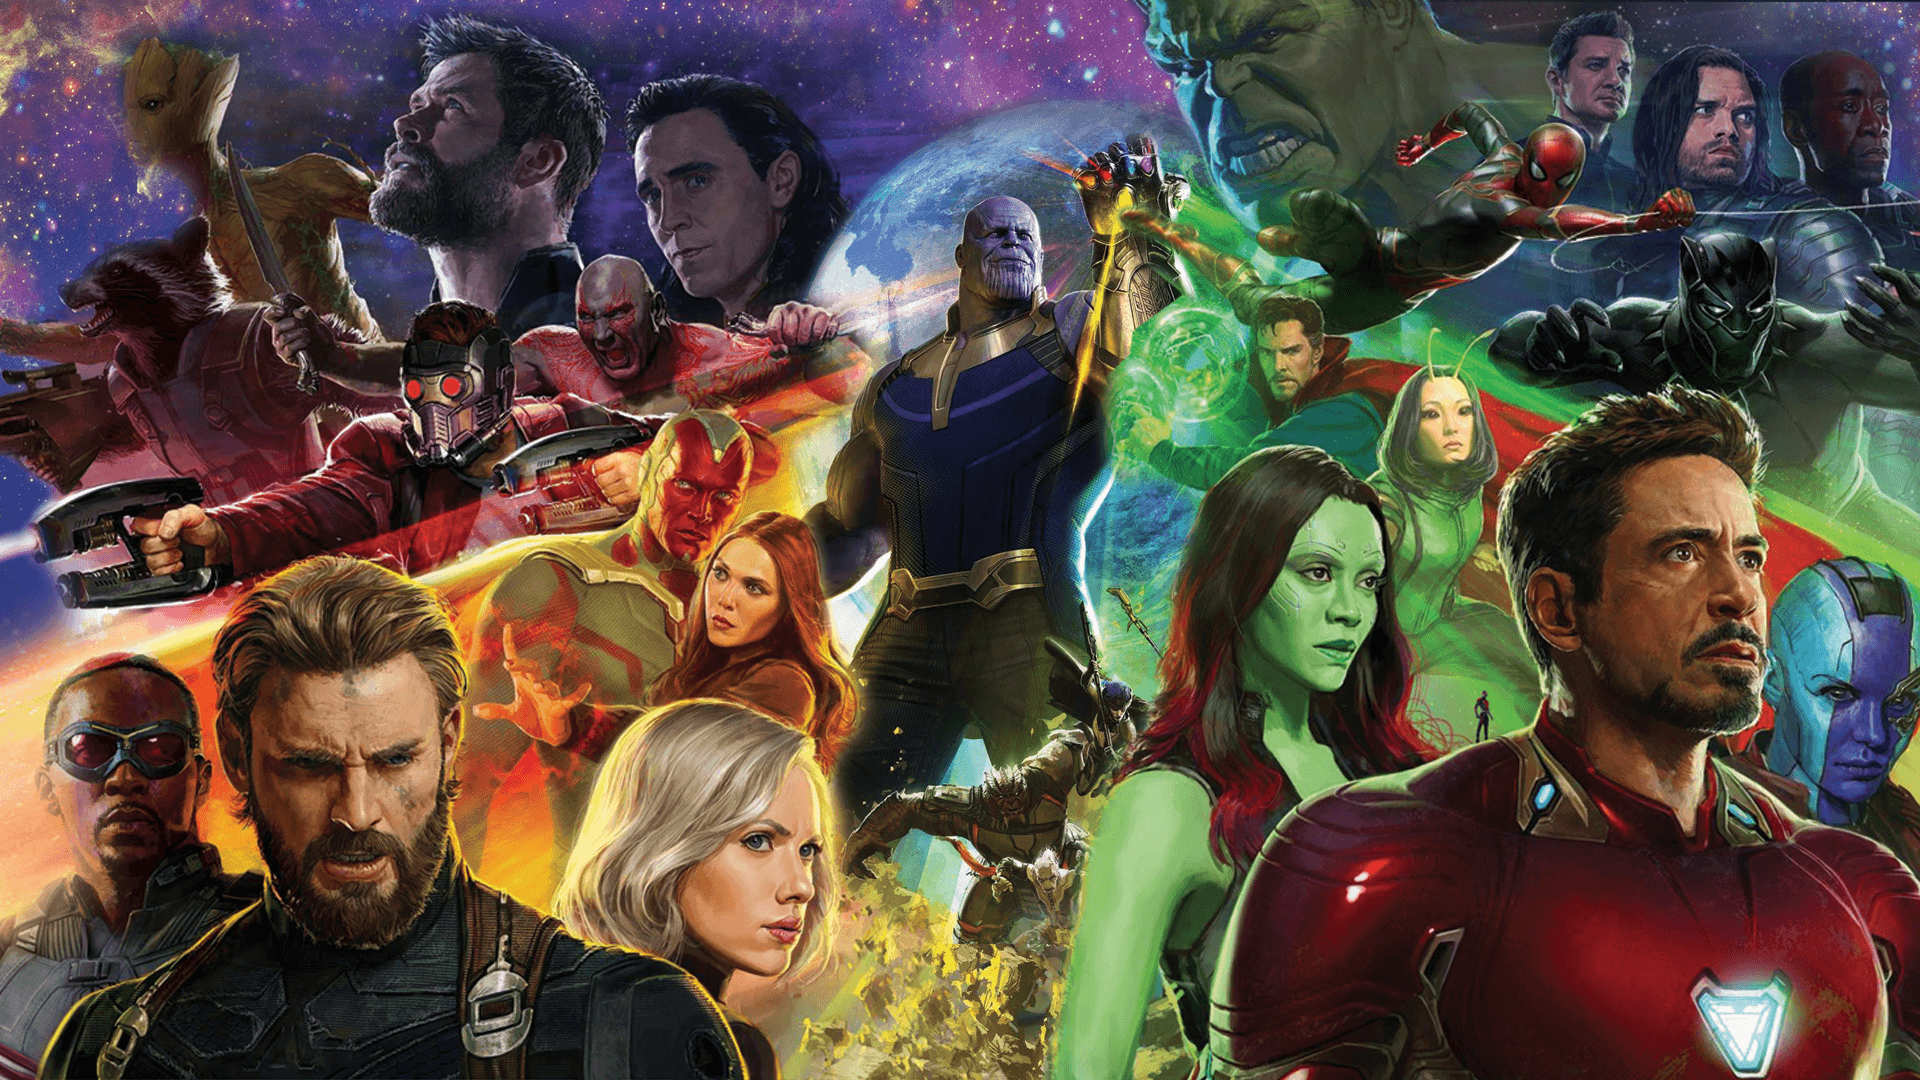 Avengers Infinity War Hd 2018 Wallpapers Wallpaper Cave